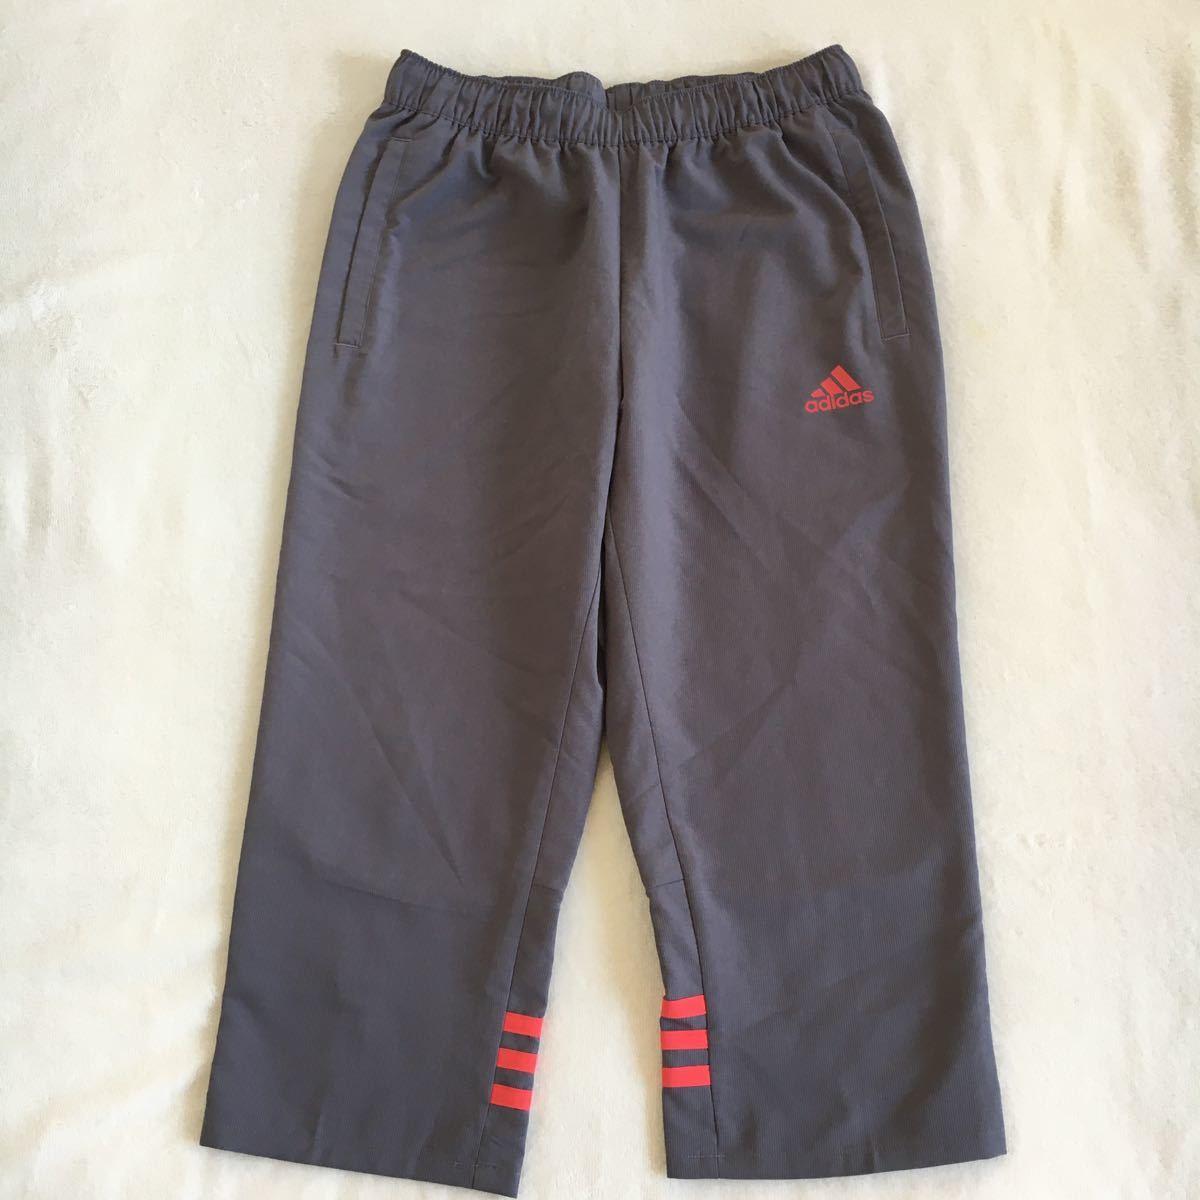 【S】adidas 七分丈パンツ スポーツウェア ランニング ヨガ ピラティス フィットネス 【送料無料】【美品】